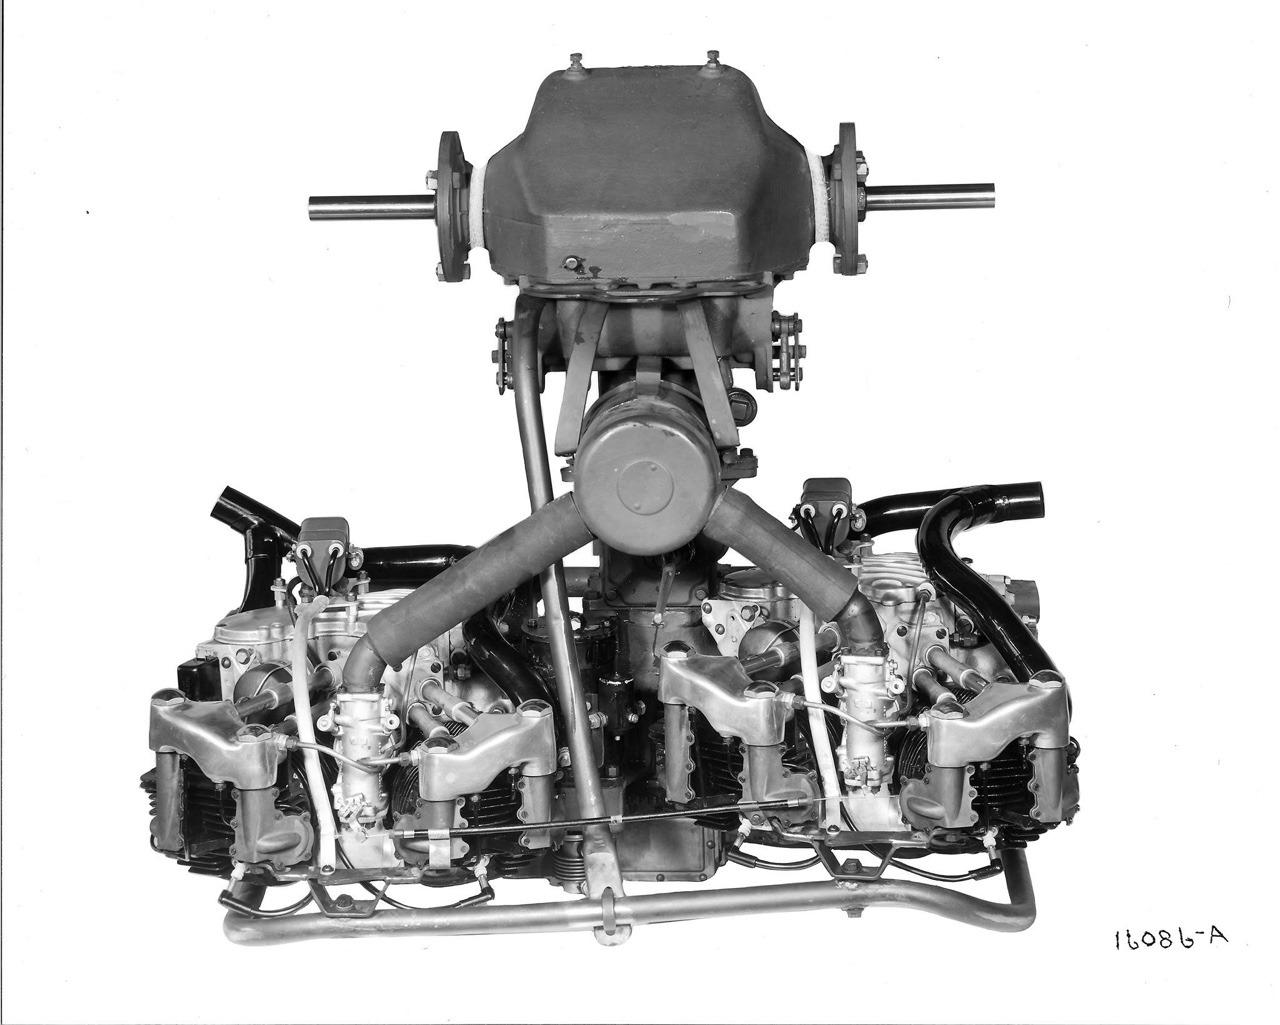 Vista posterior del doble motor